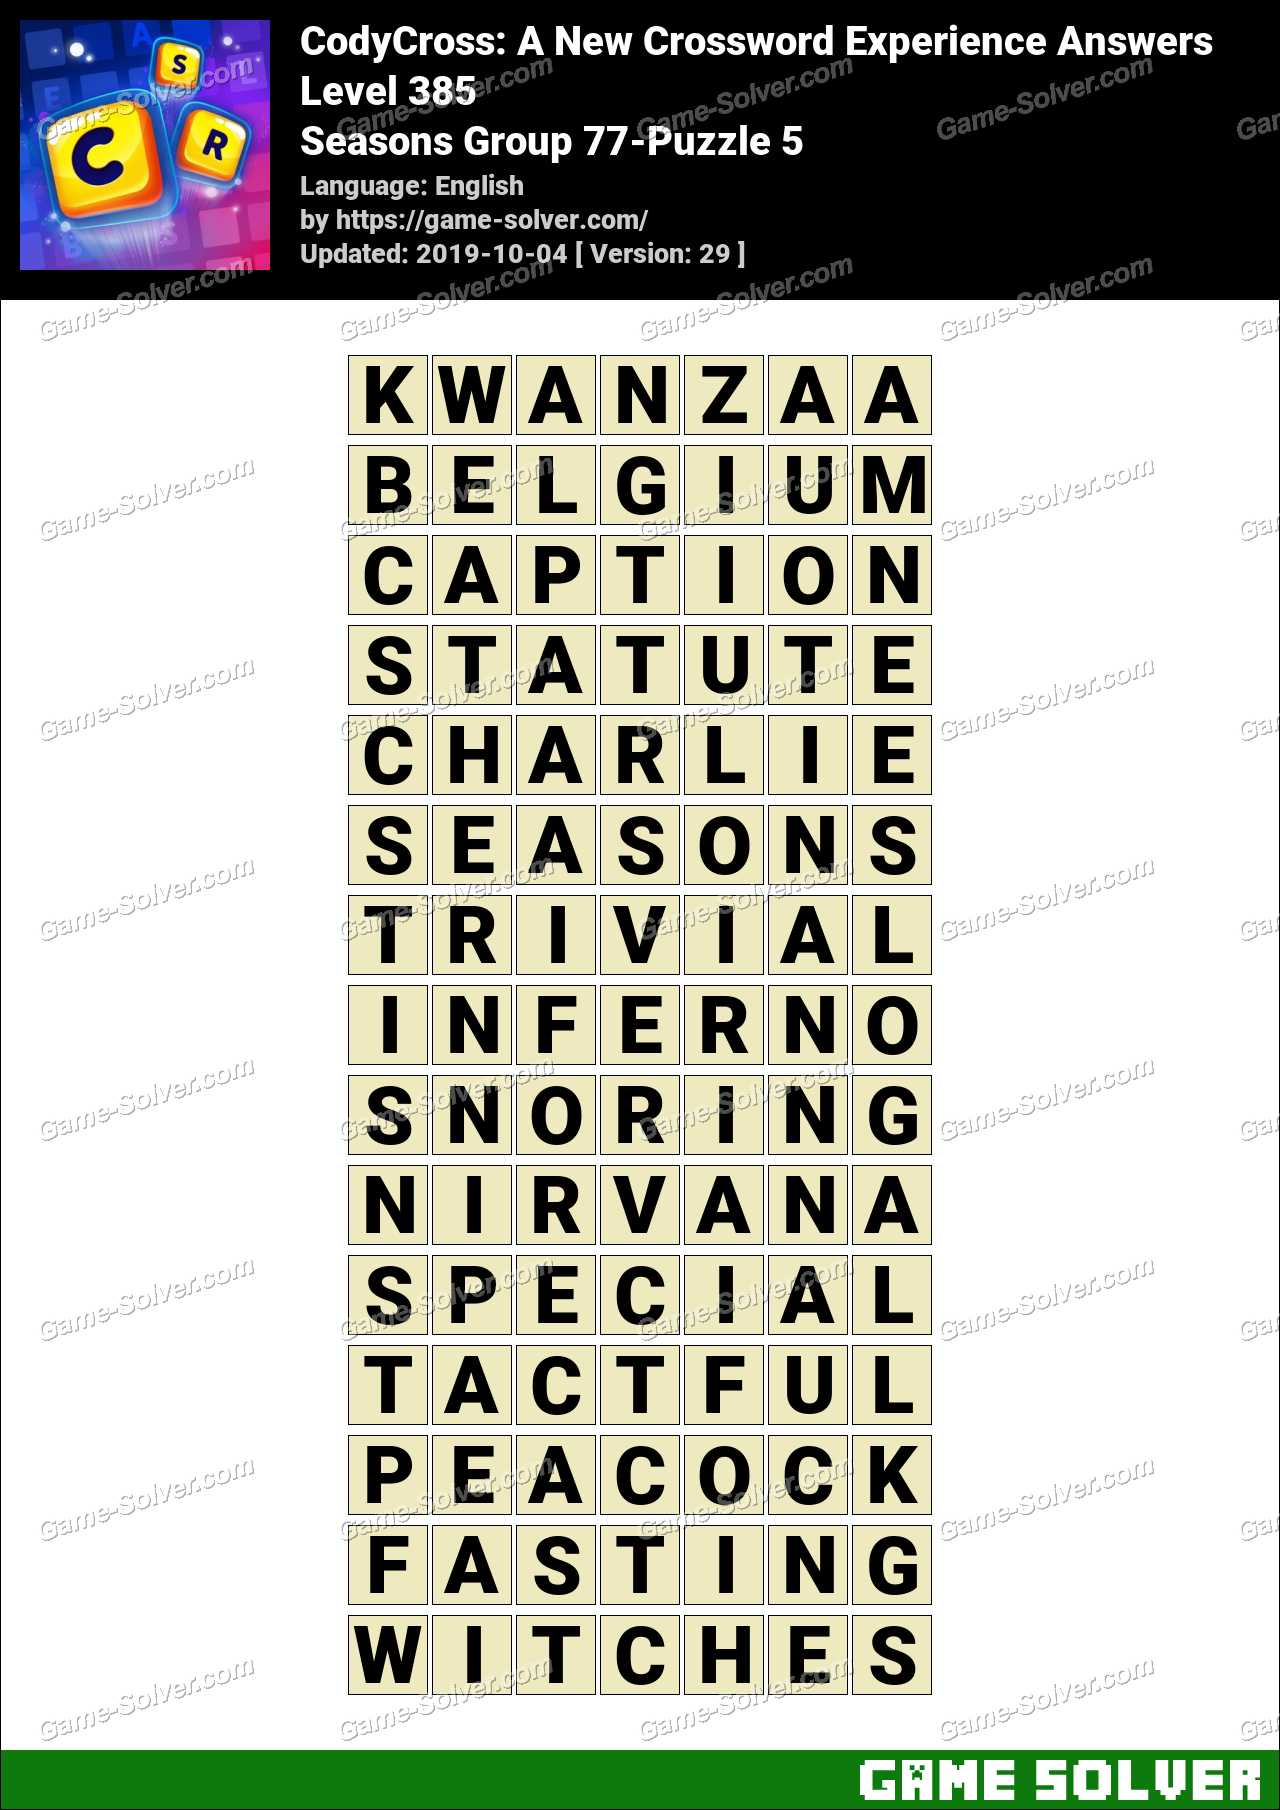 CodyCross Seasons Group 77-Puzzle 5 Answers